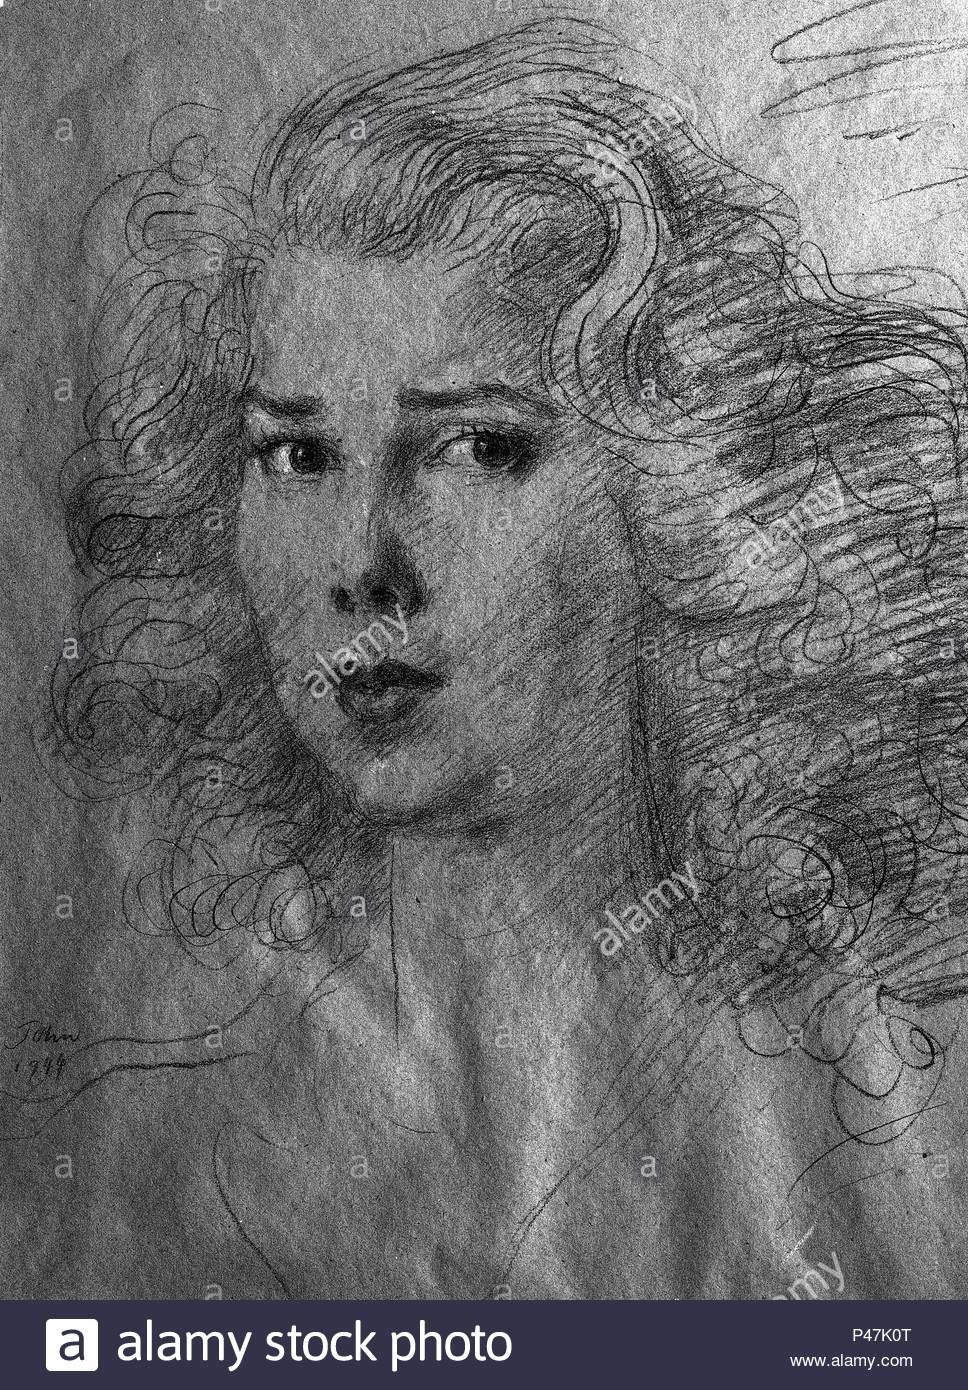 Duquesa De Montoro 1953 Dibujo Con Lapiz Carboncillo Papel